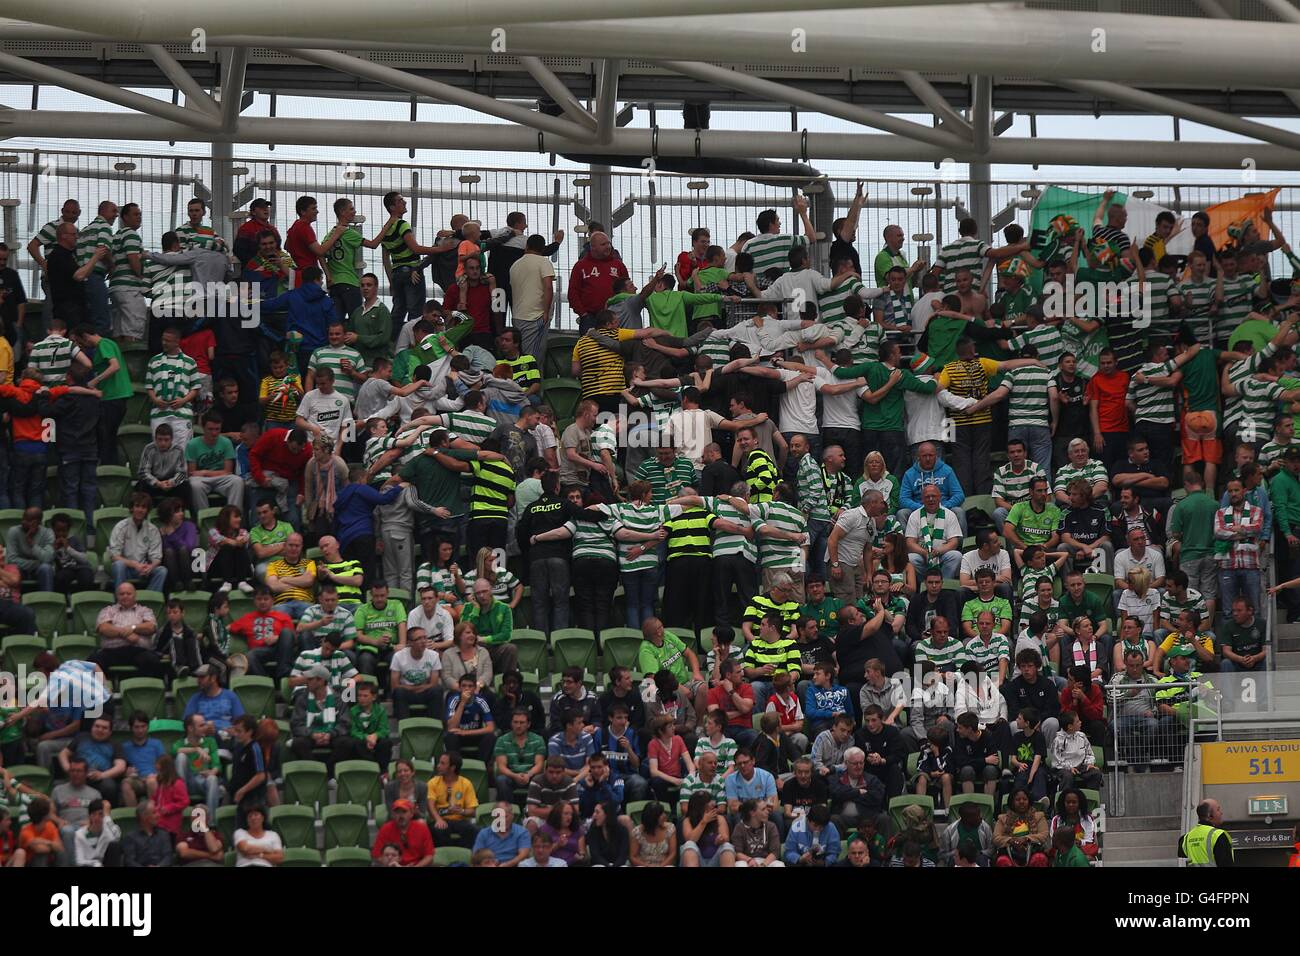 Soccer - Pre Season Friendly - The Dublin Super Cup - Inter Milan v Celtic - Aviva Stadium - Stock Image